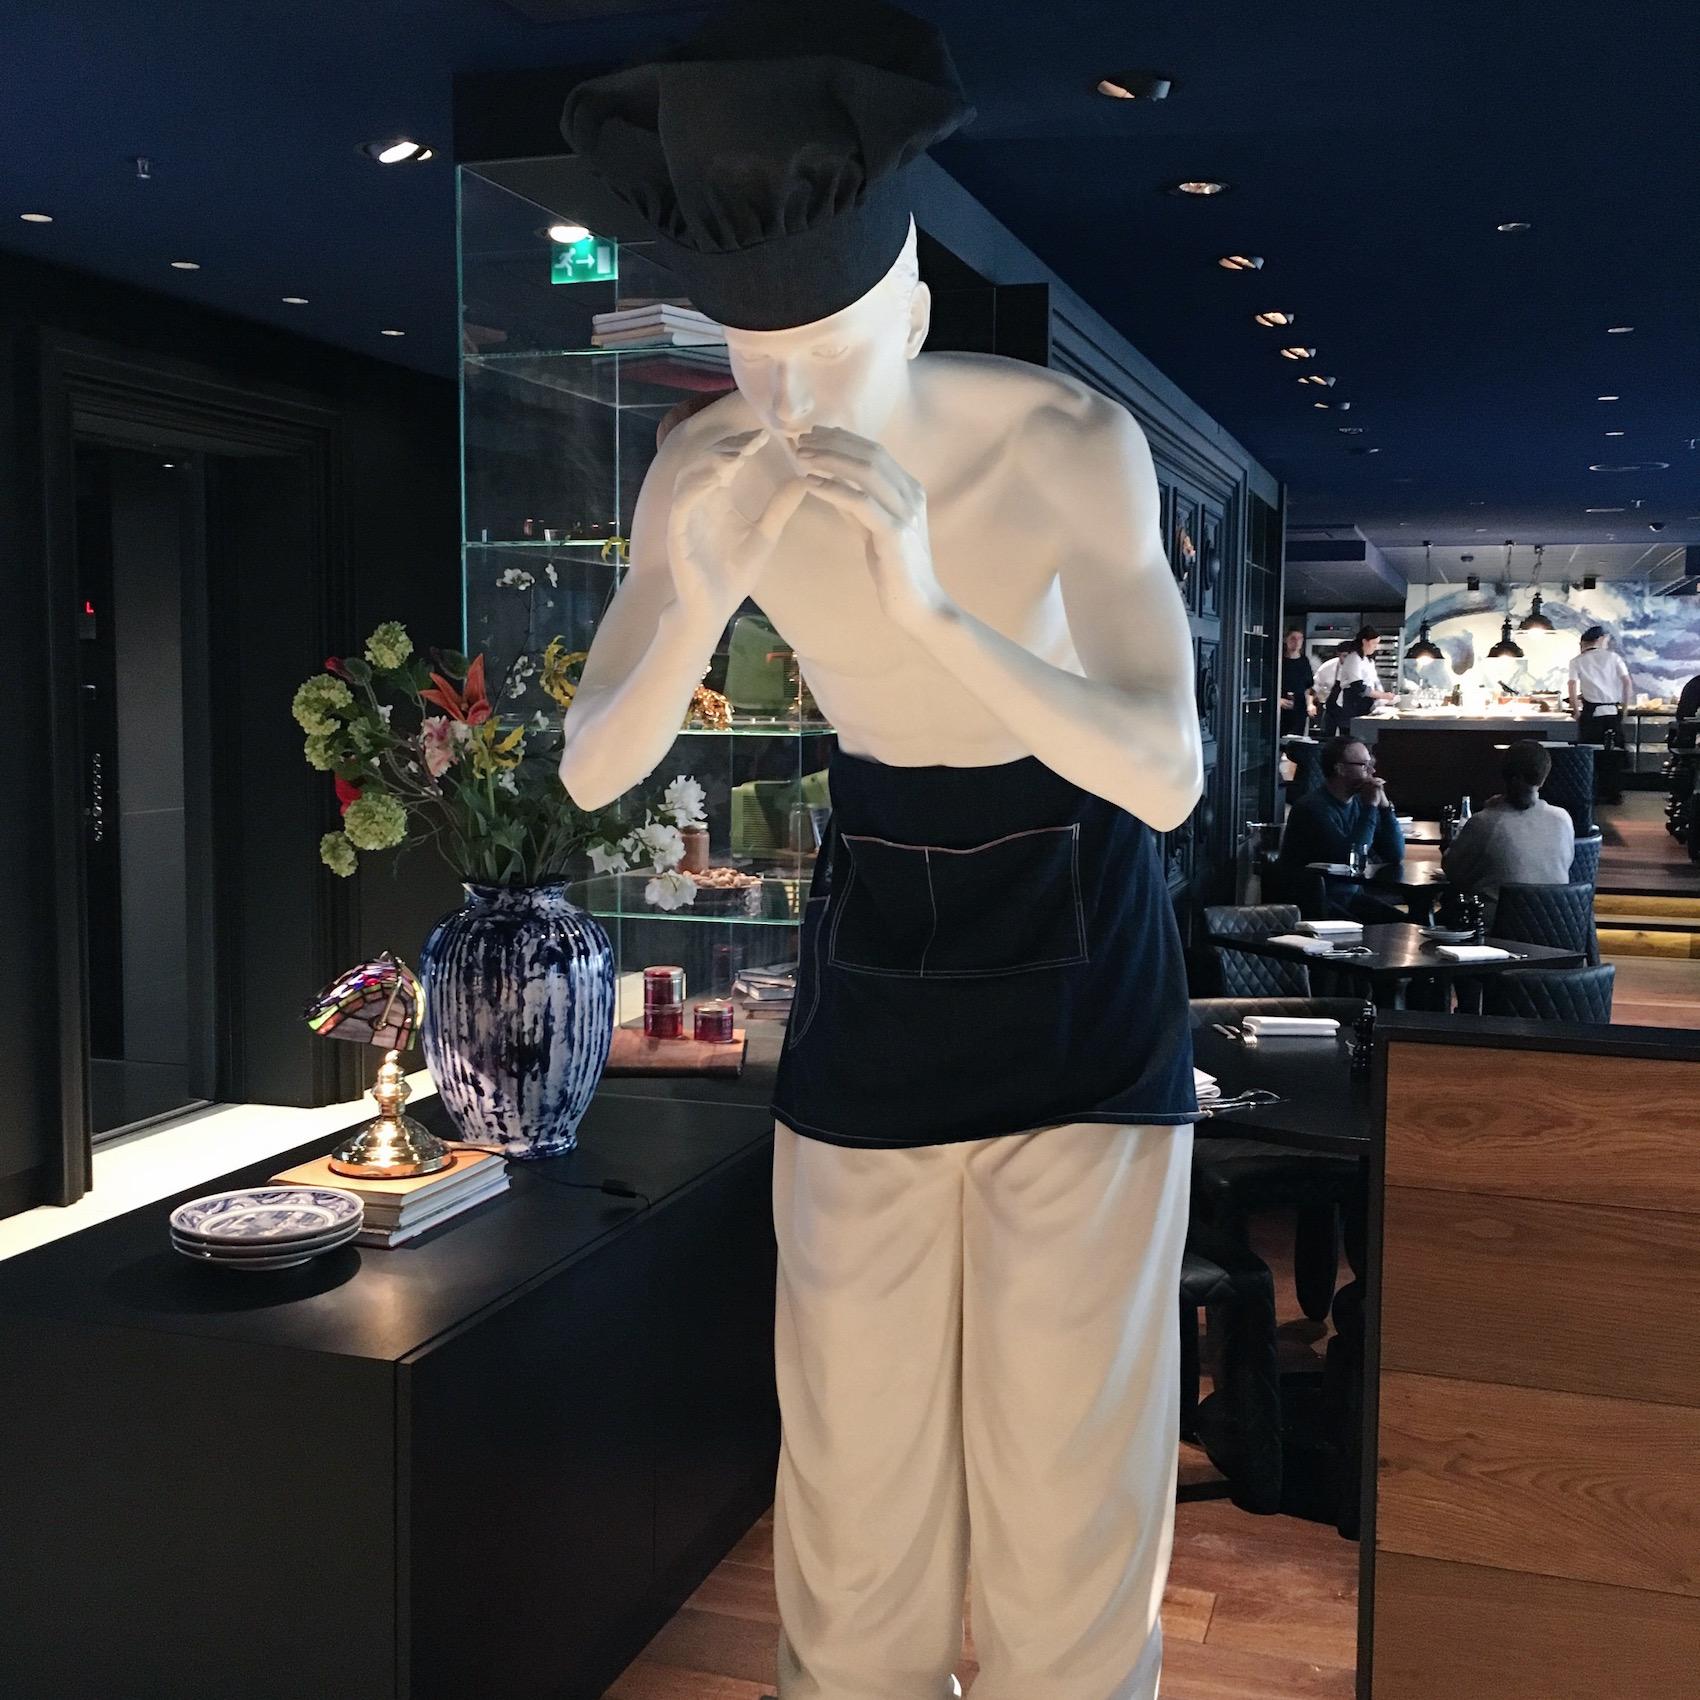 suelovesnyc_sue_loves_nyc_travel_blog_lifestyle_reise_blog_reisen_amsterdam_hotel_tipp_hotel_andaz_amsterdam_breakfast